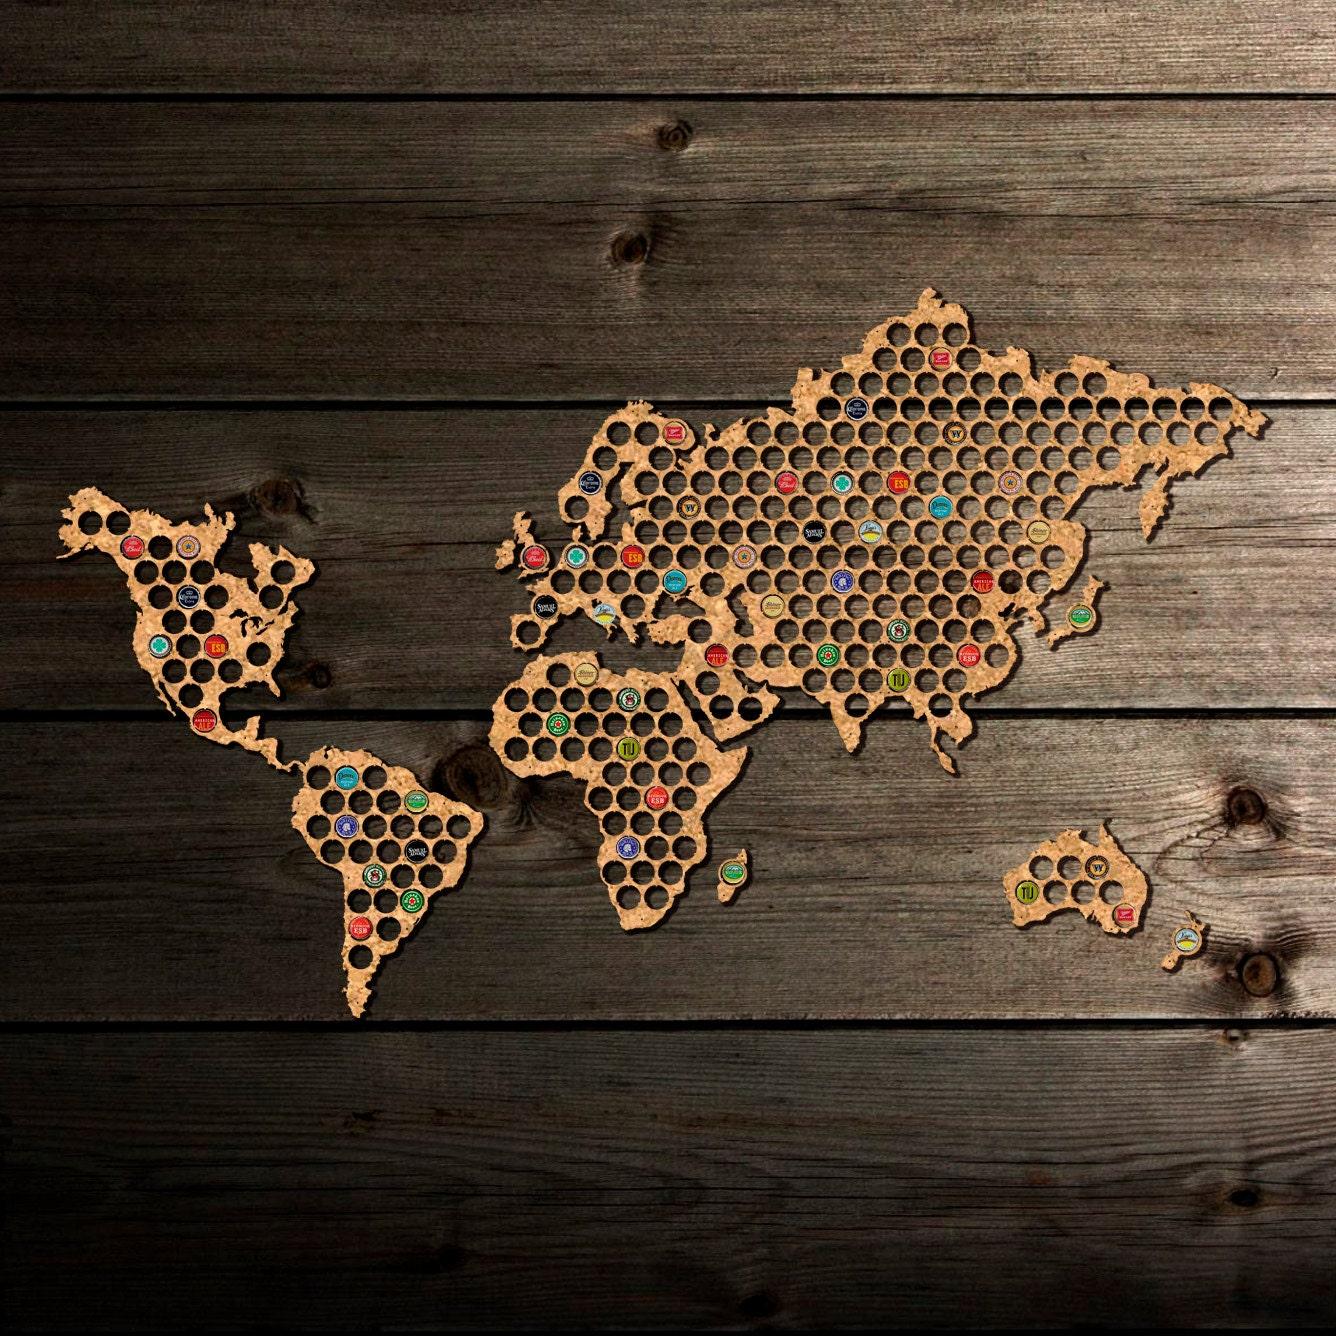 World beer cap map from cork tree beer cap holder beer cap zoom gumiabroncs Choice Image